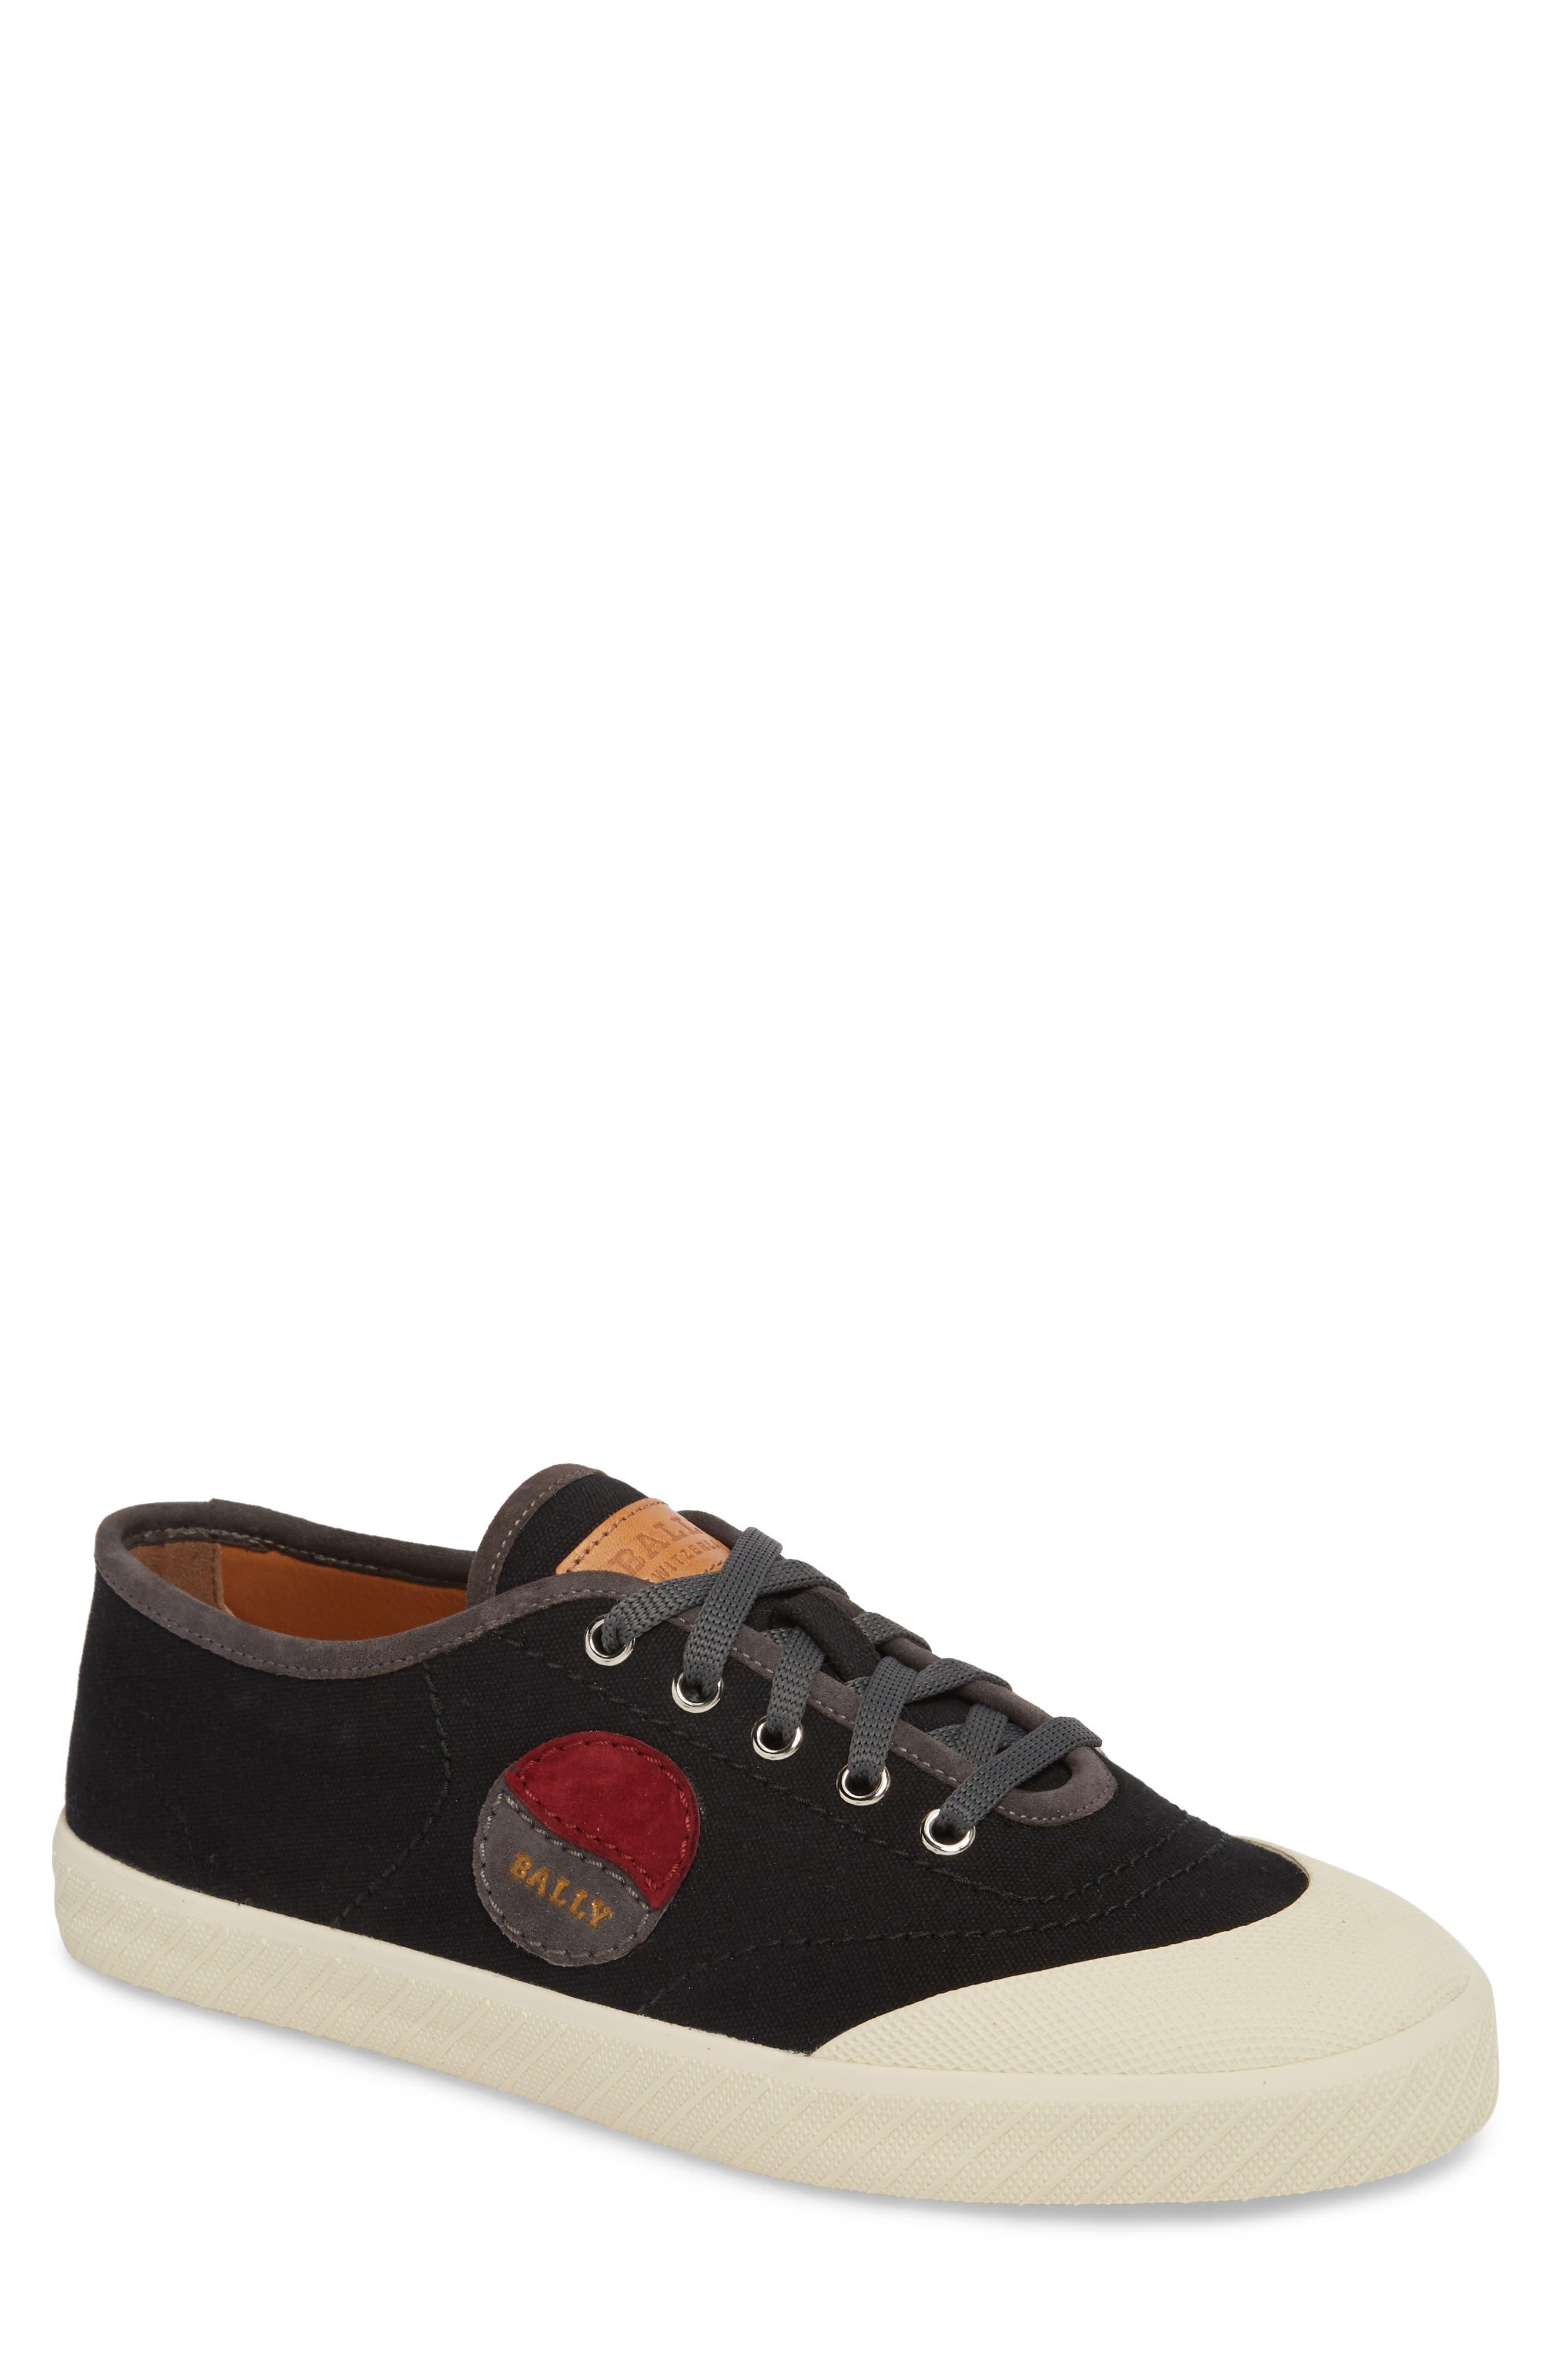 Silio Low Top Sneaker,                             Main thumbnail 1, color,                             001